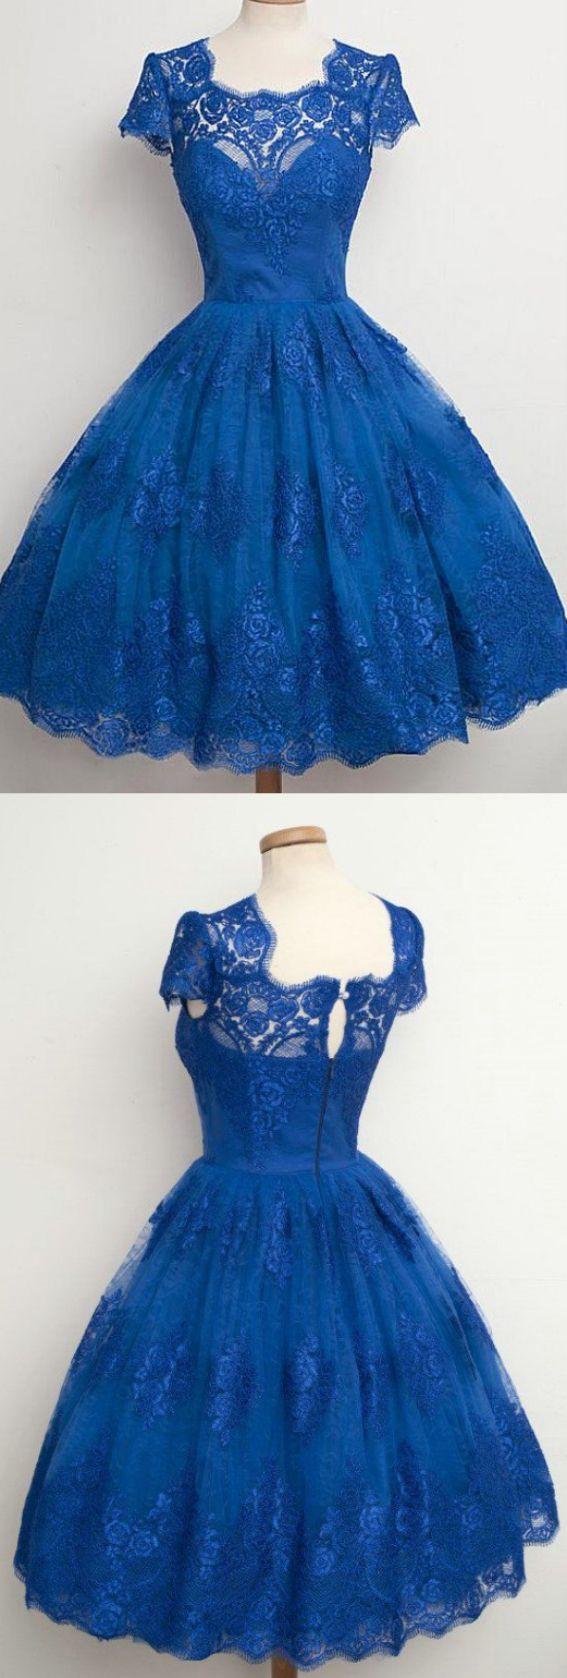 Square prom dresses blue short prom dresses vintage scallopededge